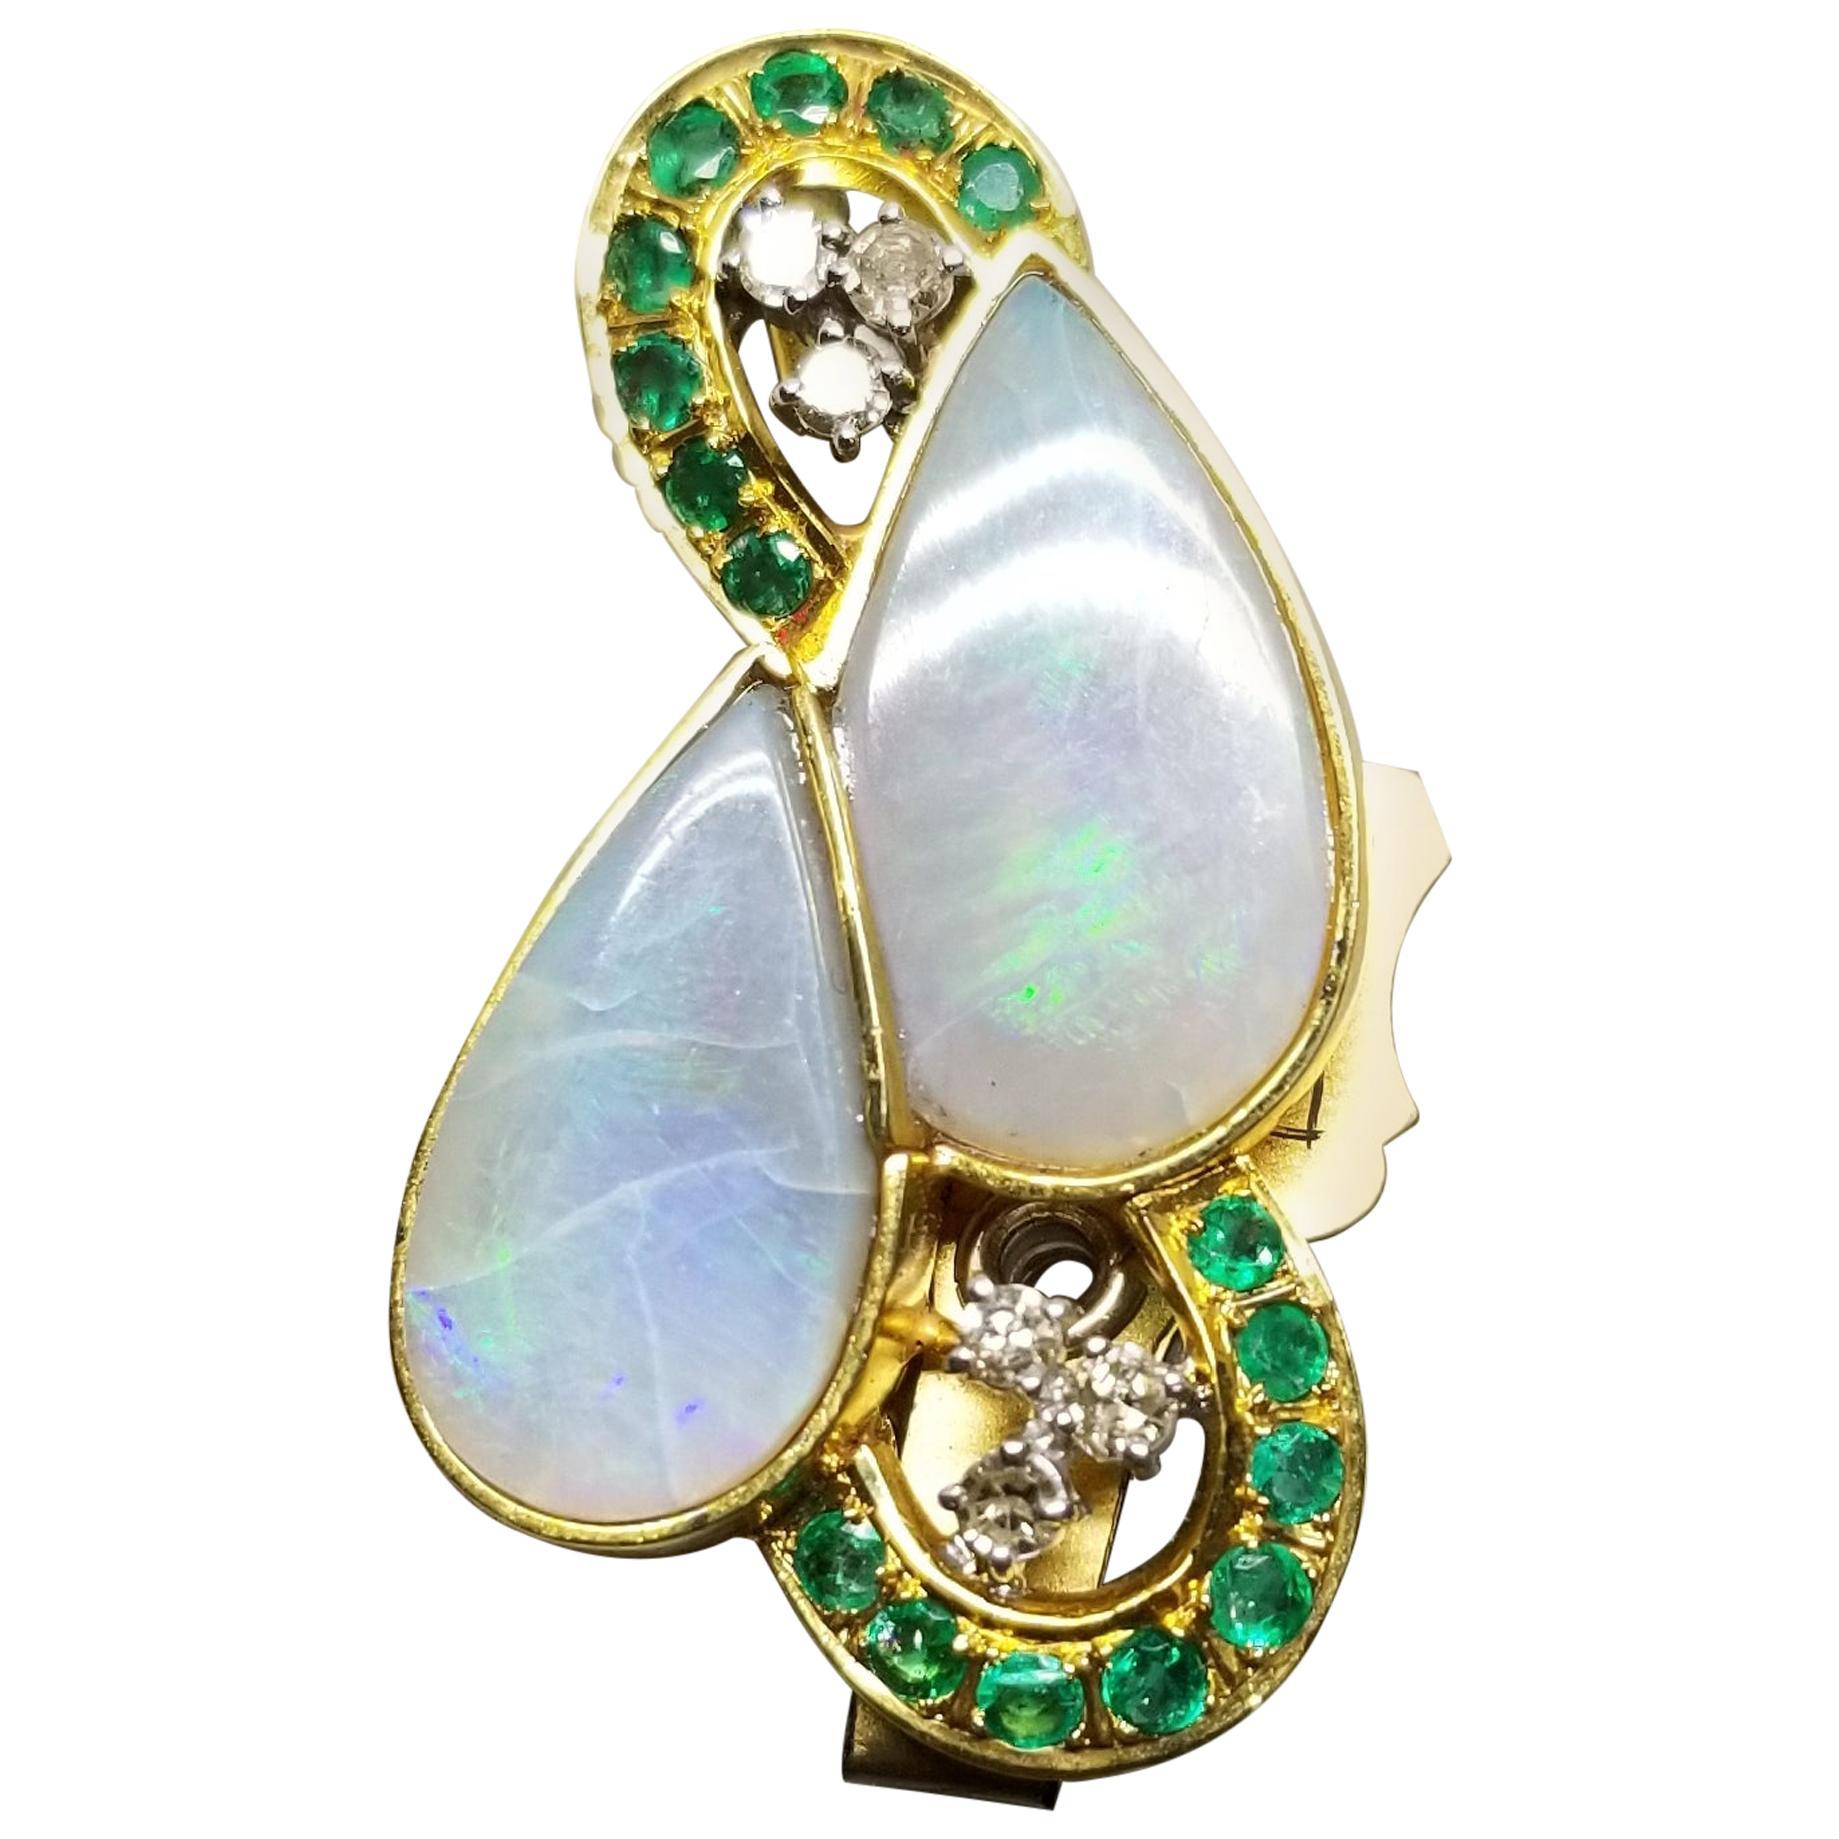 14 Karat Opal Pin/Pendant with Diamonds and Emeralds